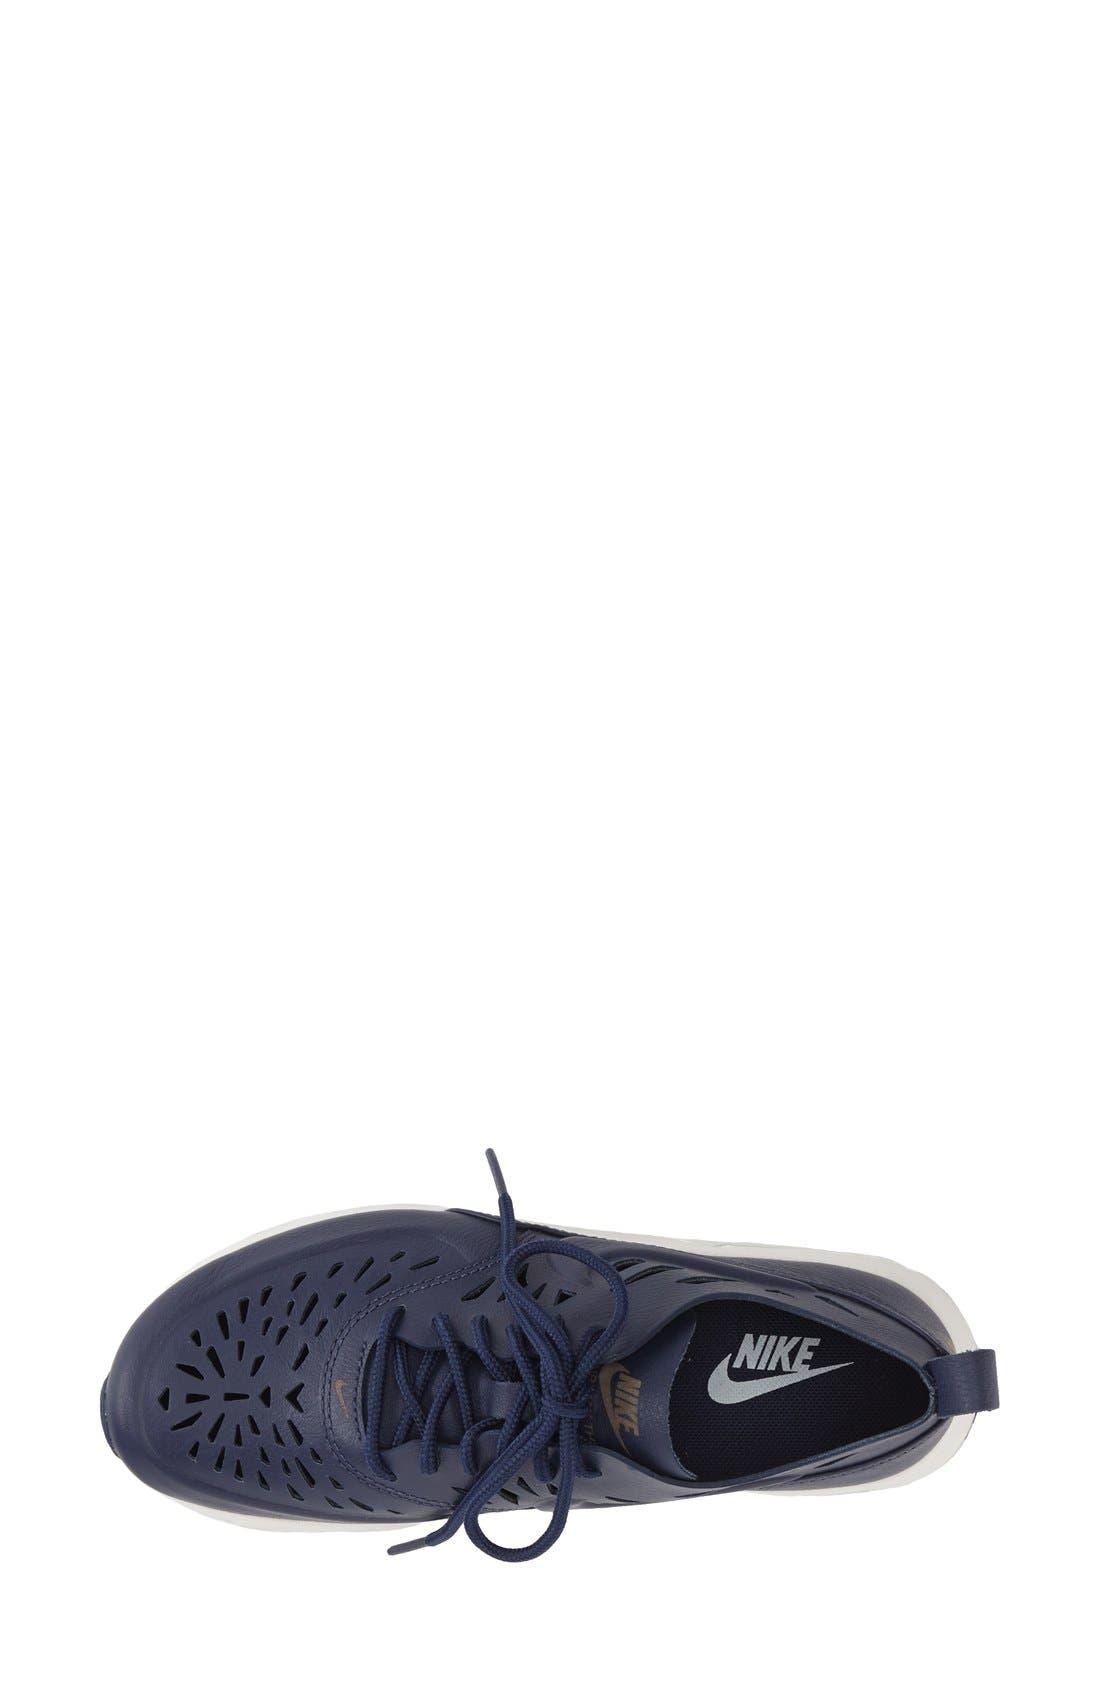 Alternate Image 3  - Nike 'Air Max Thea Joli' Sneaker (Women)